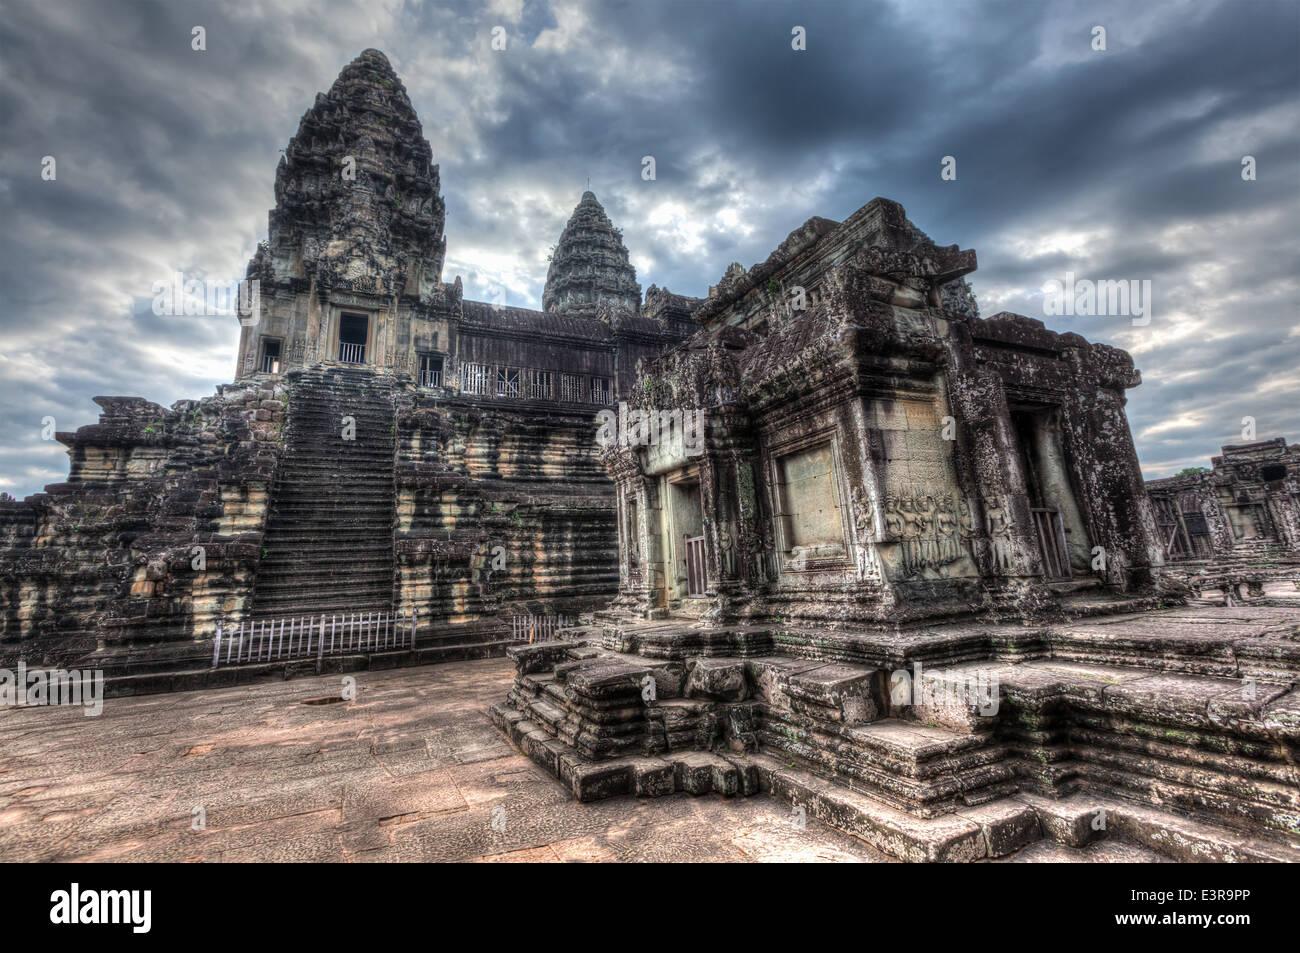 High dynamic range (hdr) image of Angkor Wat - famous Cambodian landmark Siem Reap, Cambodia Stock Photo